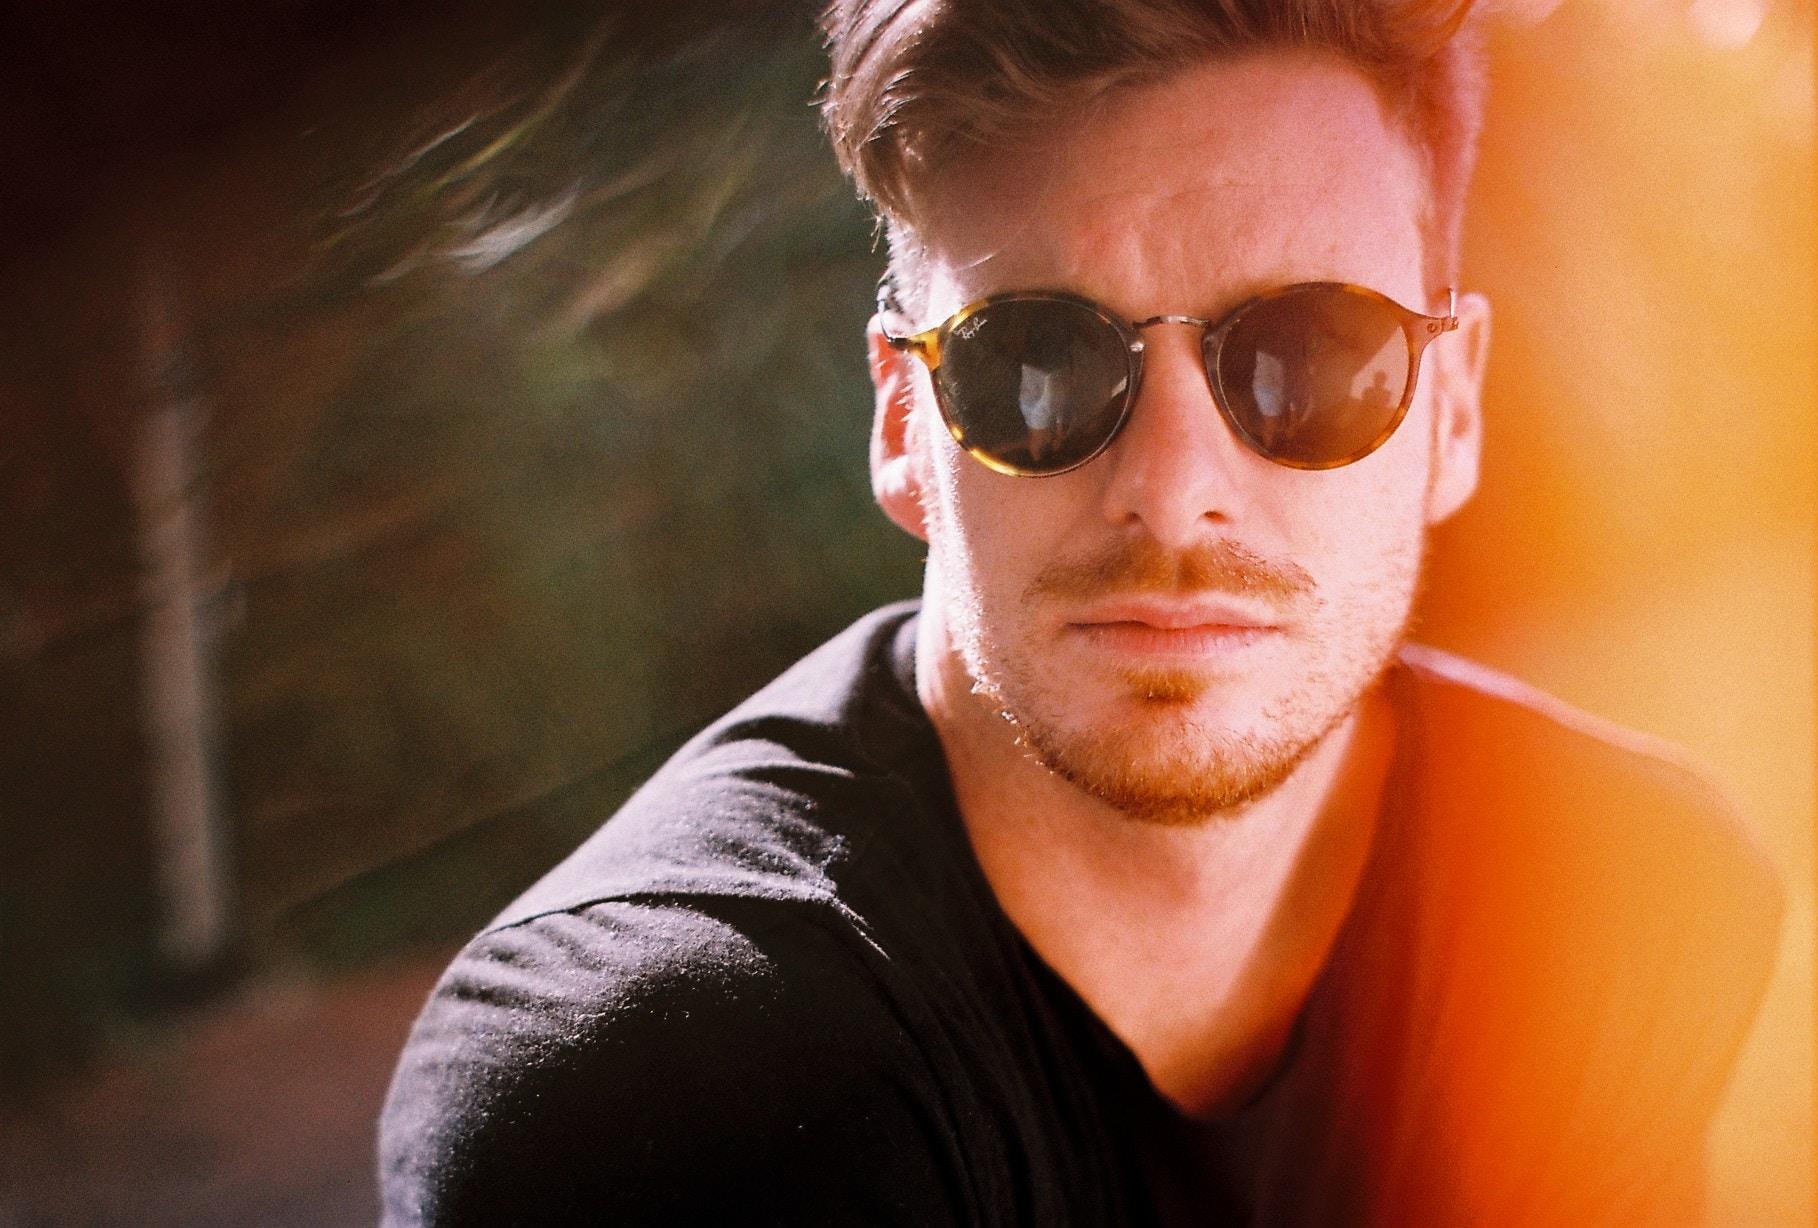 Go to Alex Vans-Colina's profile